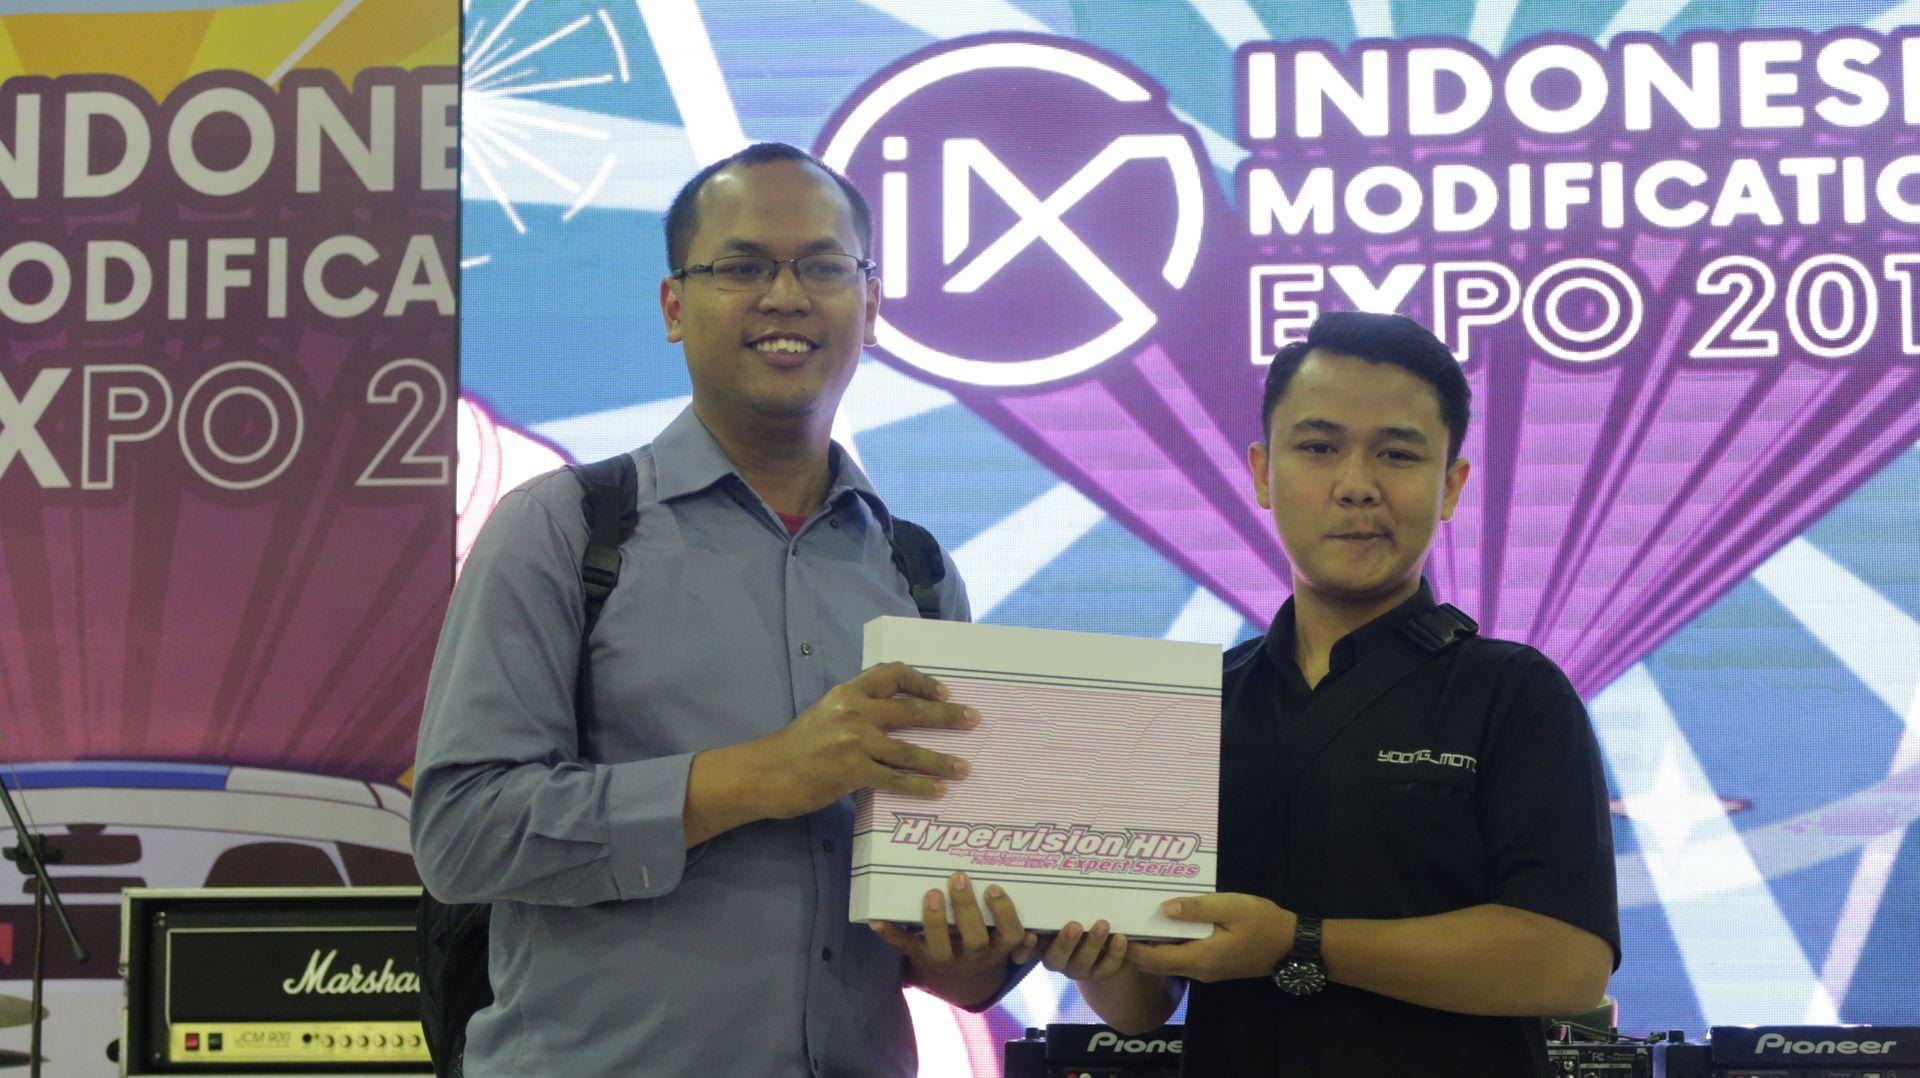 Imx giveaway (11)